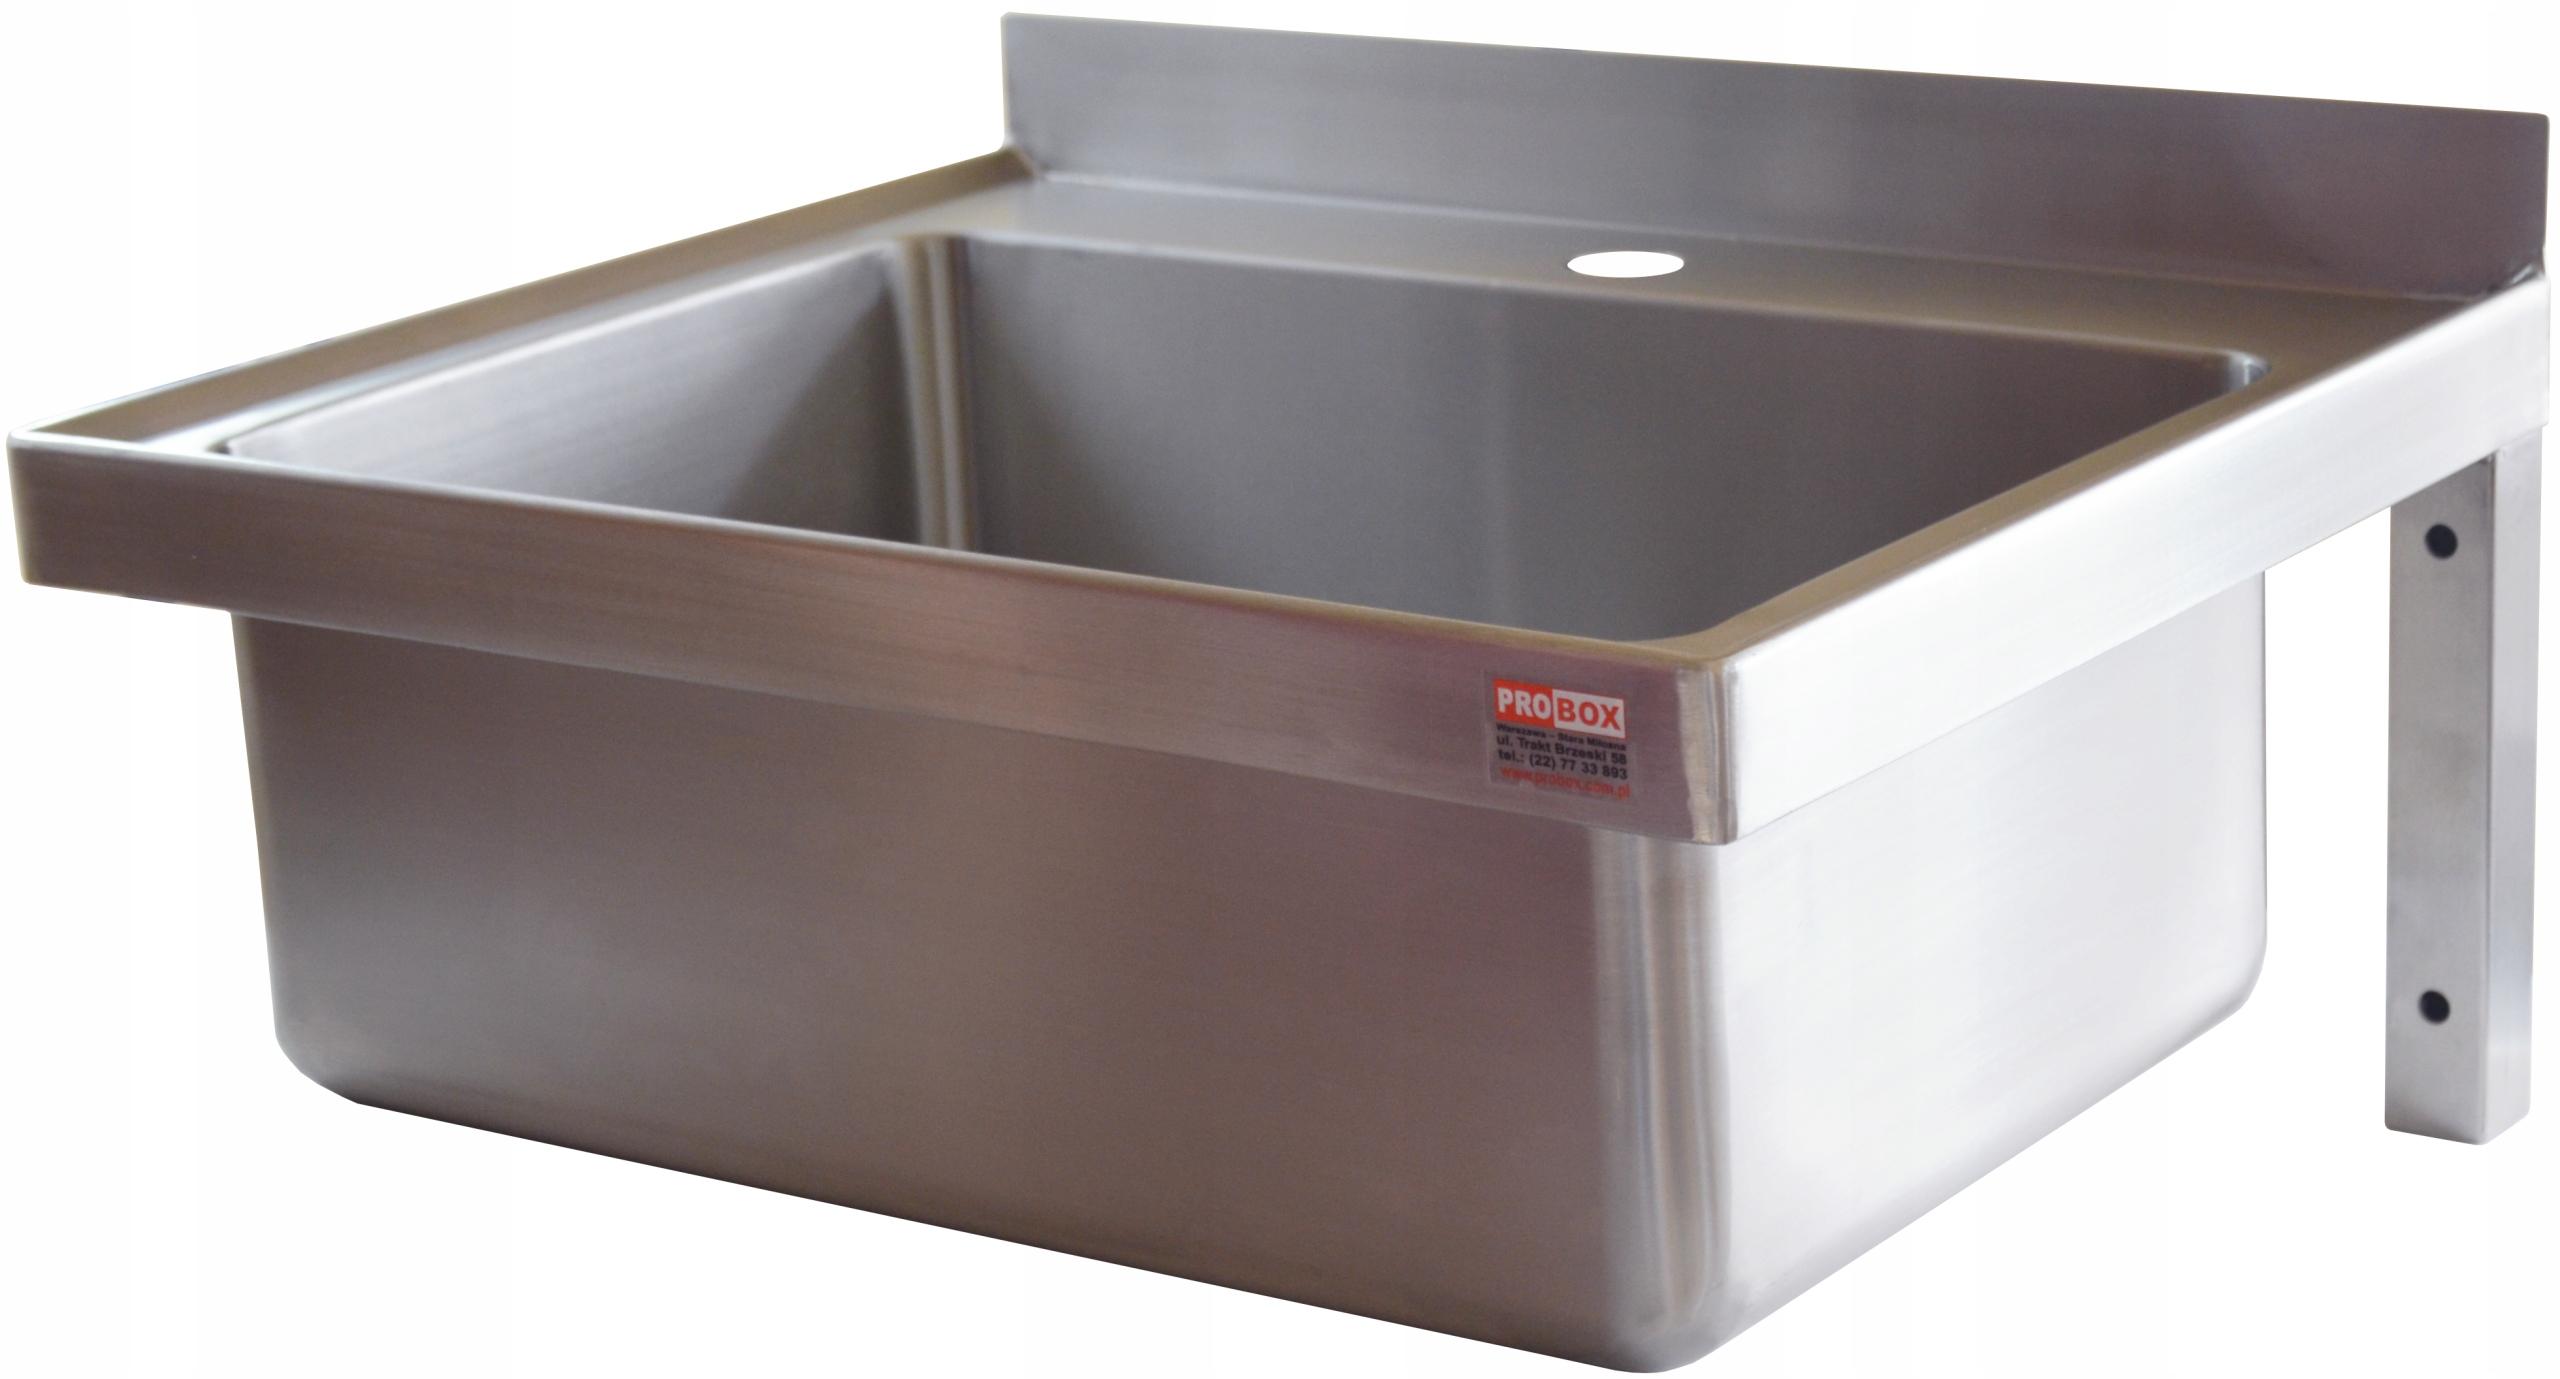 Objednávka-ekonomický umývadlo 50x40x27 cm od ruky FV